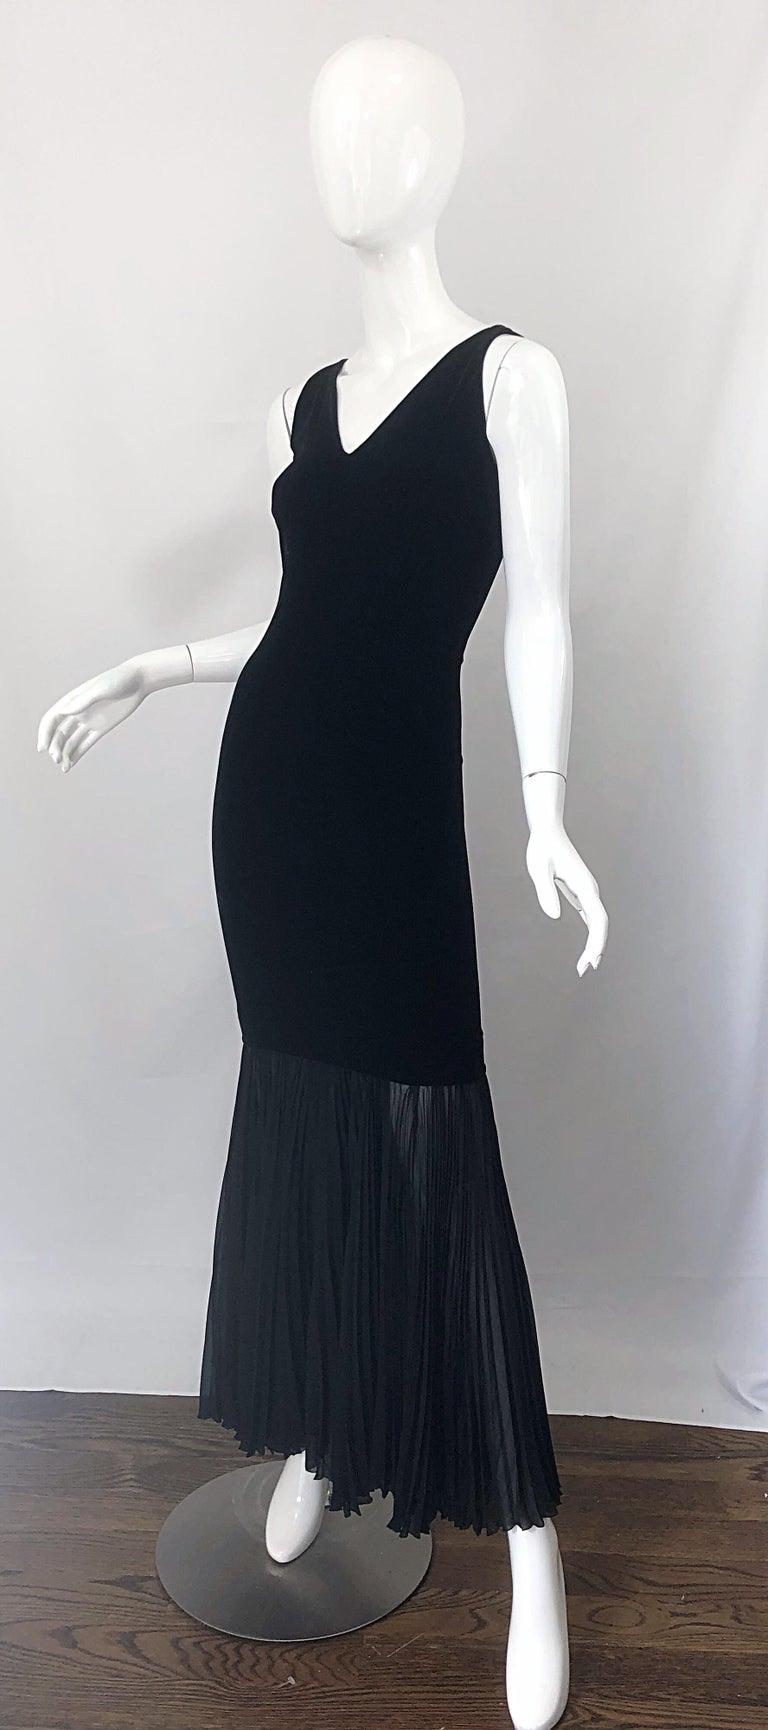 1990s Jean Paul Gaultier Avant Garde Black Velvet Vintage 90s Mermaid Gown Dress For Sale 3